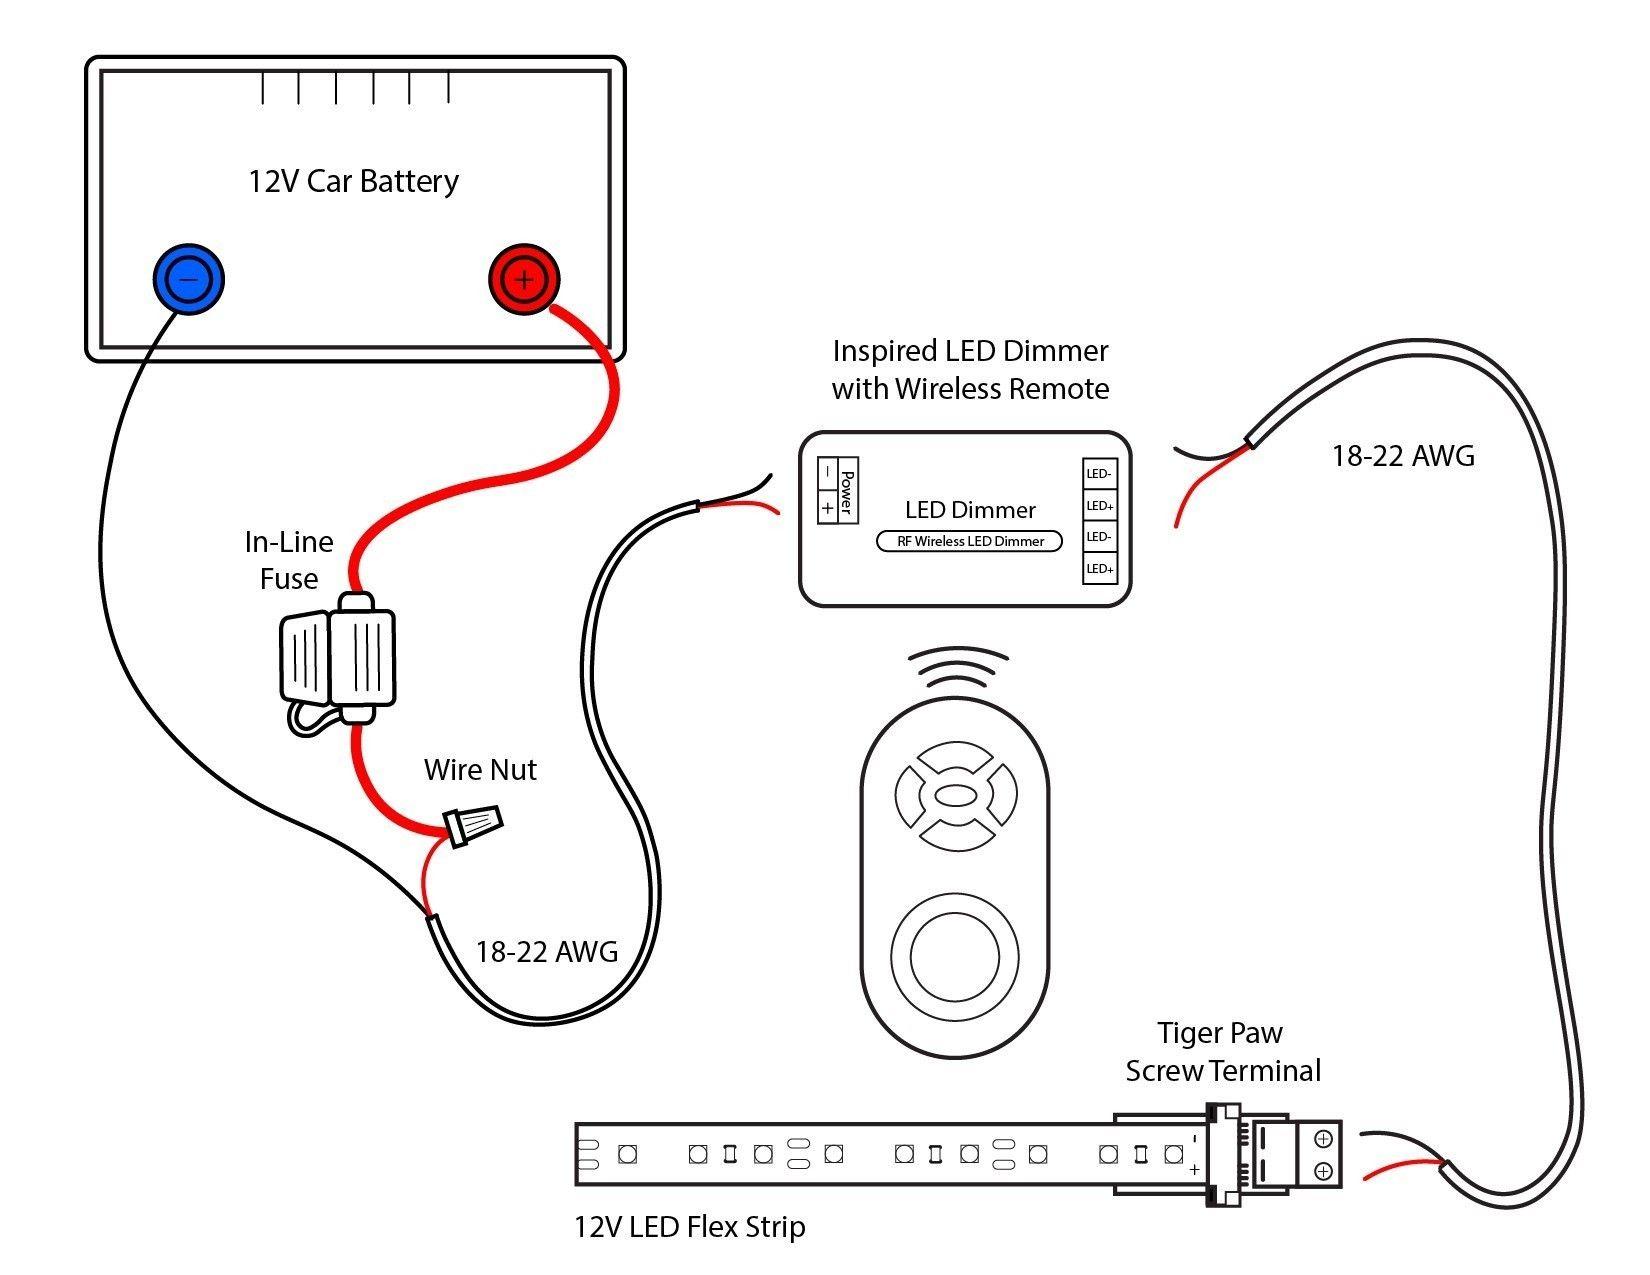 Inspirational Wiring Diagram For Rock Lights Diagrams Digramssample Diagramimages Wiringdiagra Electrical Wiring Diagram Car Battery Trailer Wiring Diagram